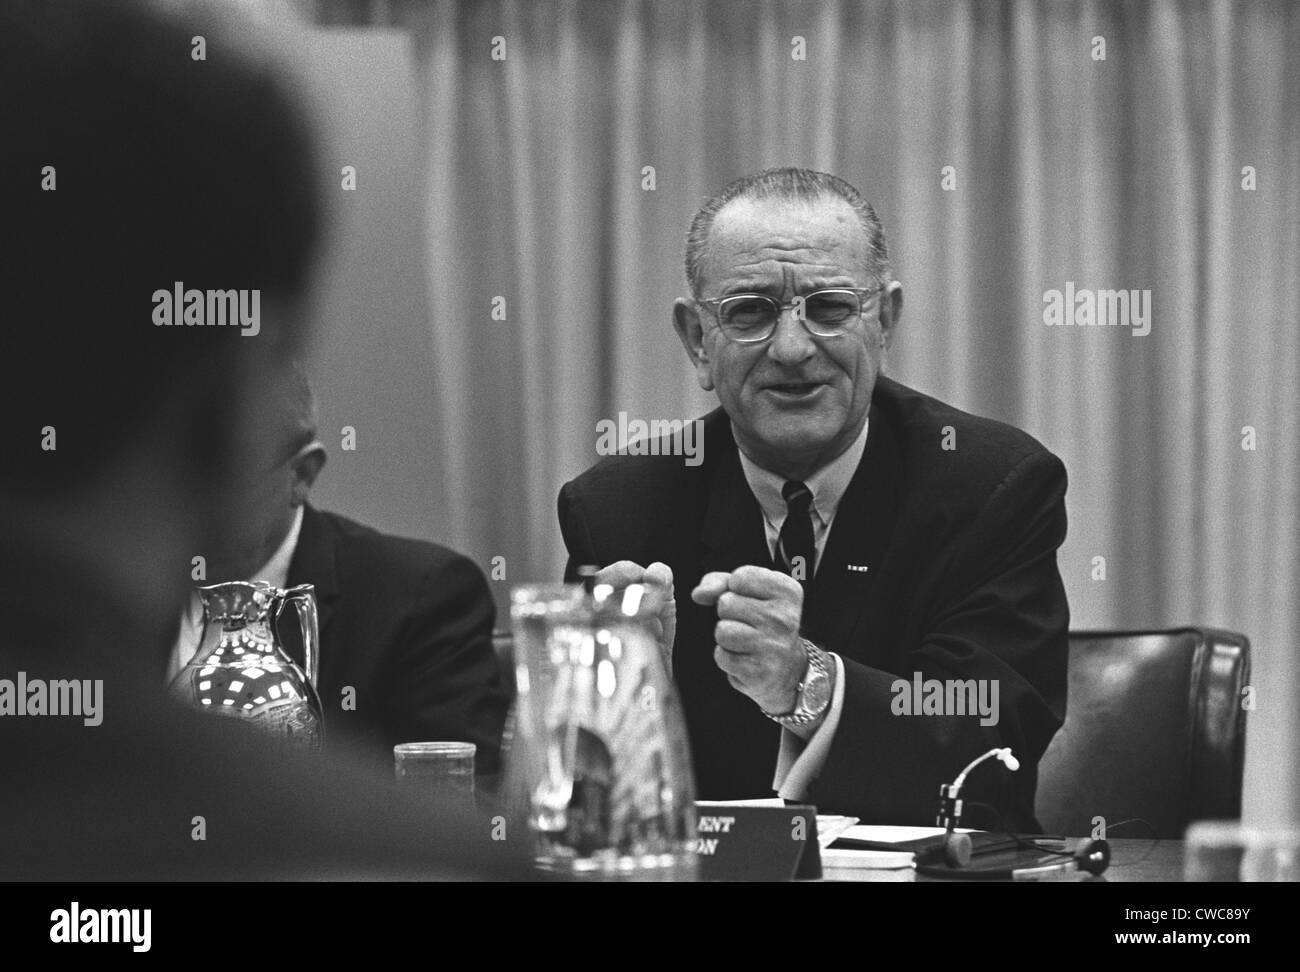 President Lyndon Johnson gesturing emotionally. LBJ was leading a Conference on the Vietnam War in Hawaii Honolulu Stock Photo